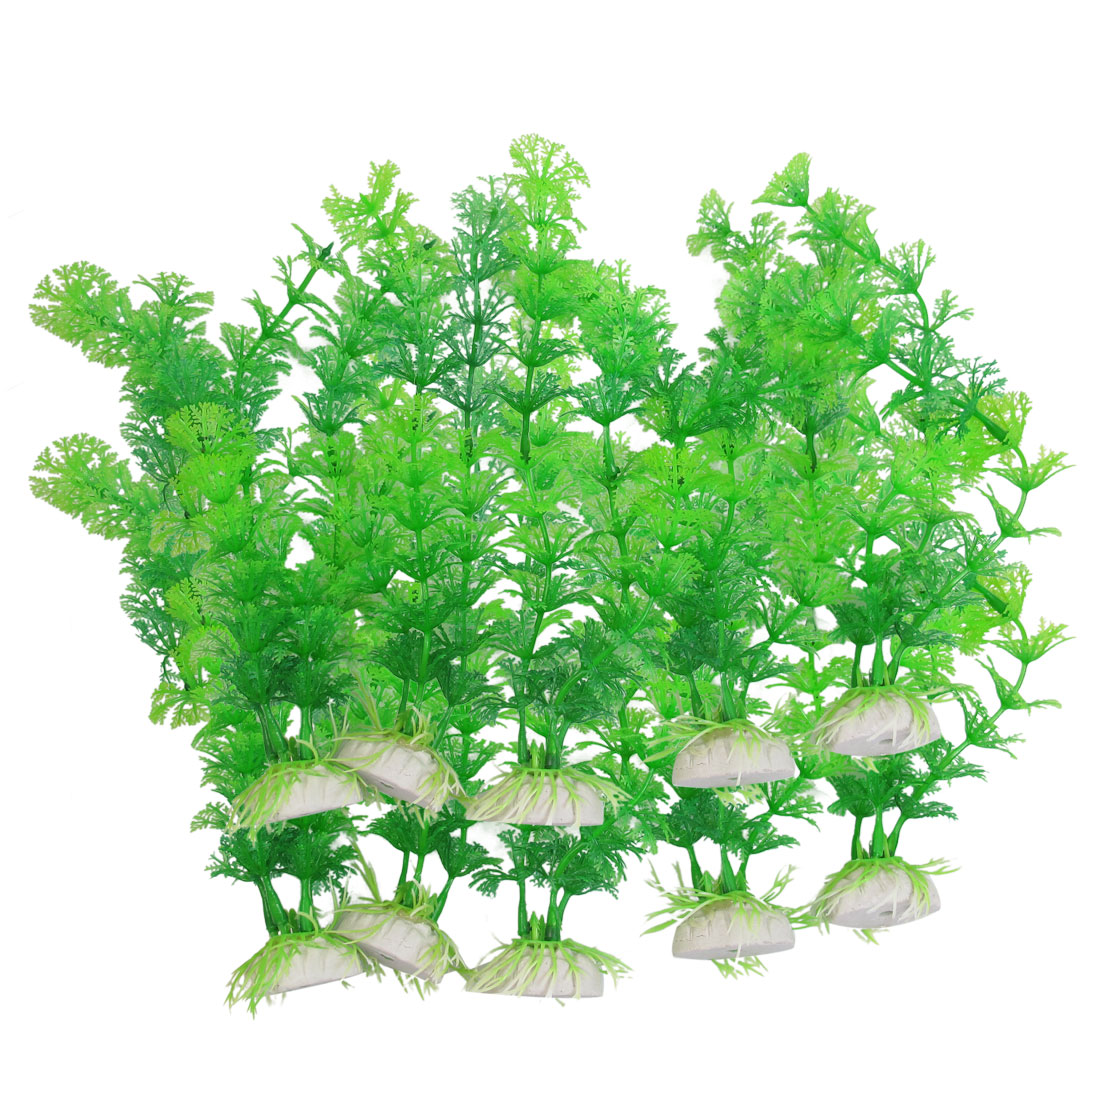 10pcs Ceramic Base Green Plastic Tank Plant Aquarium Grass